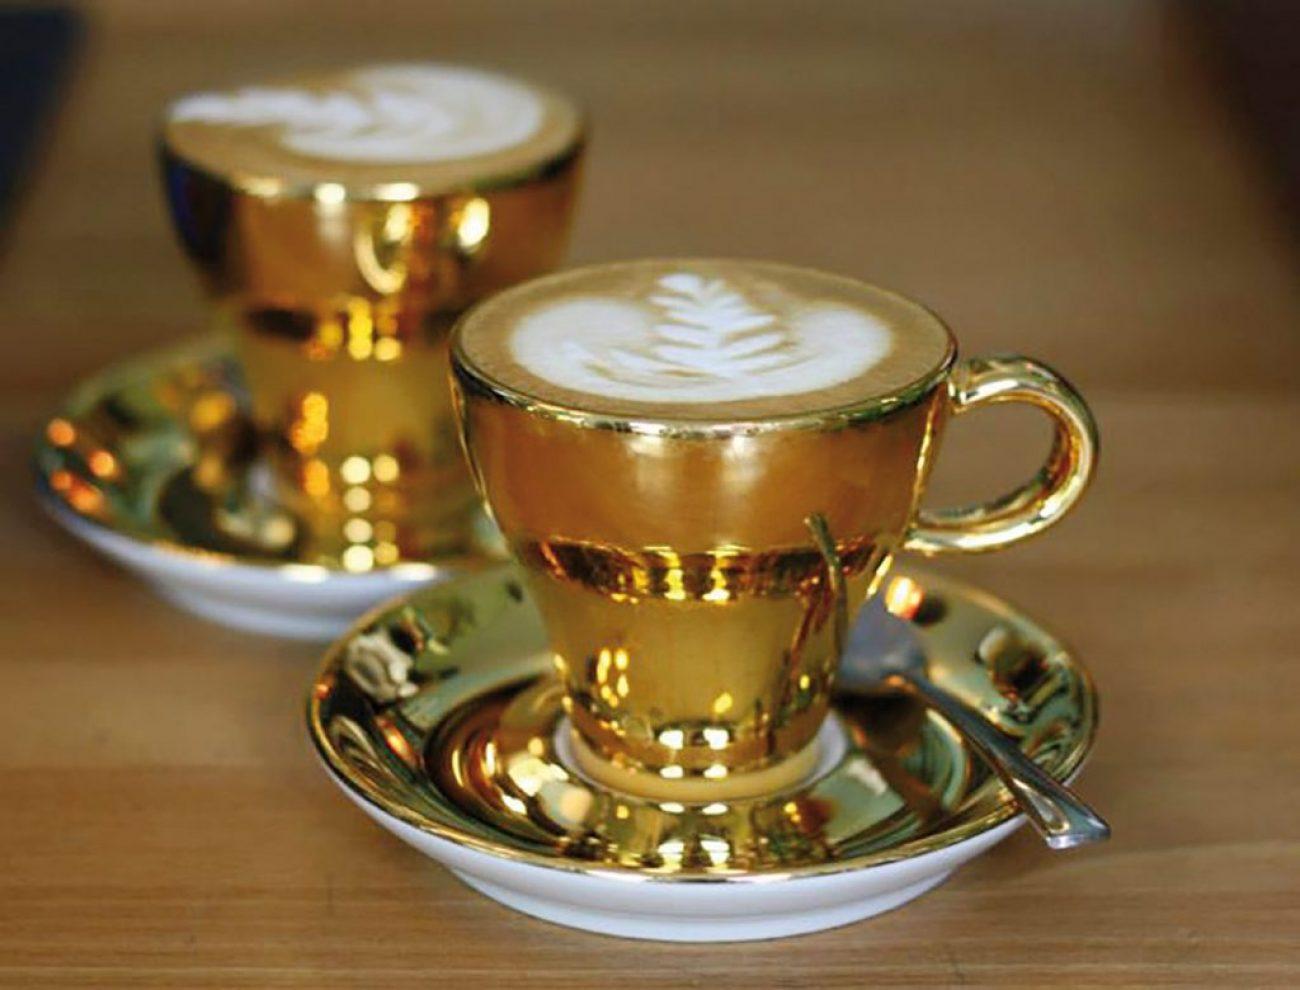 Salzburg Guide Eat & Drink - Kaffee-Alchemie